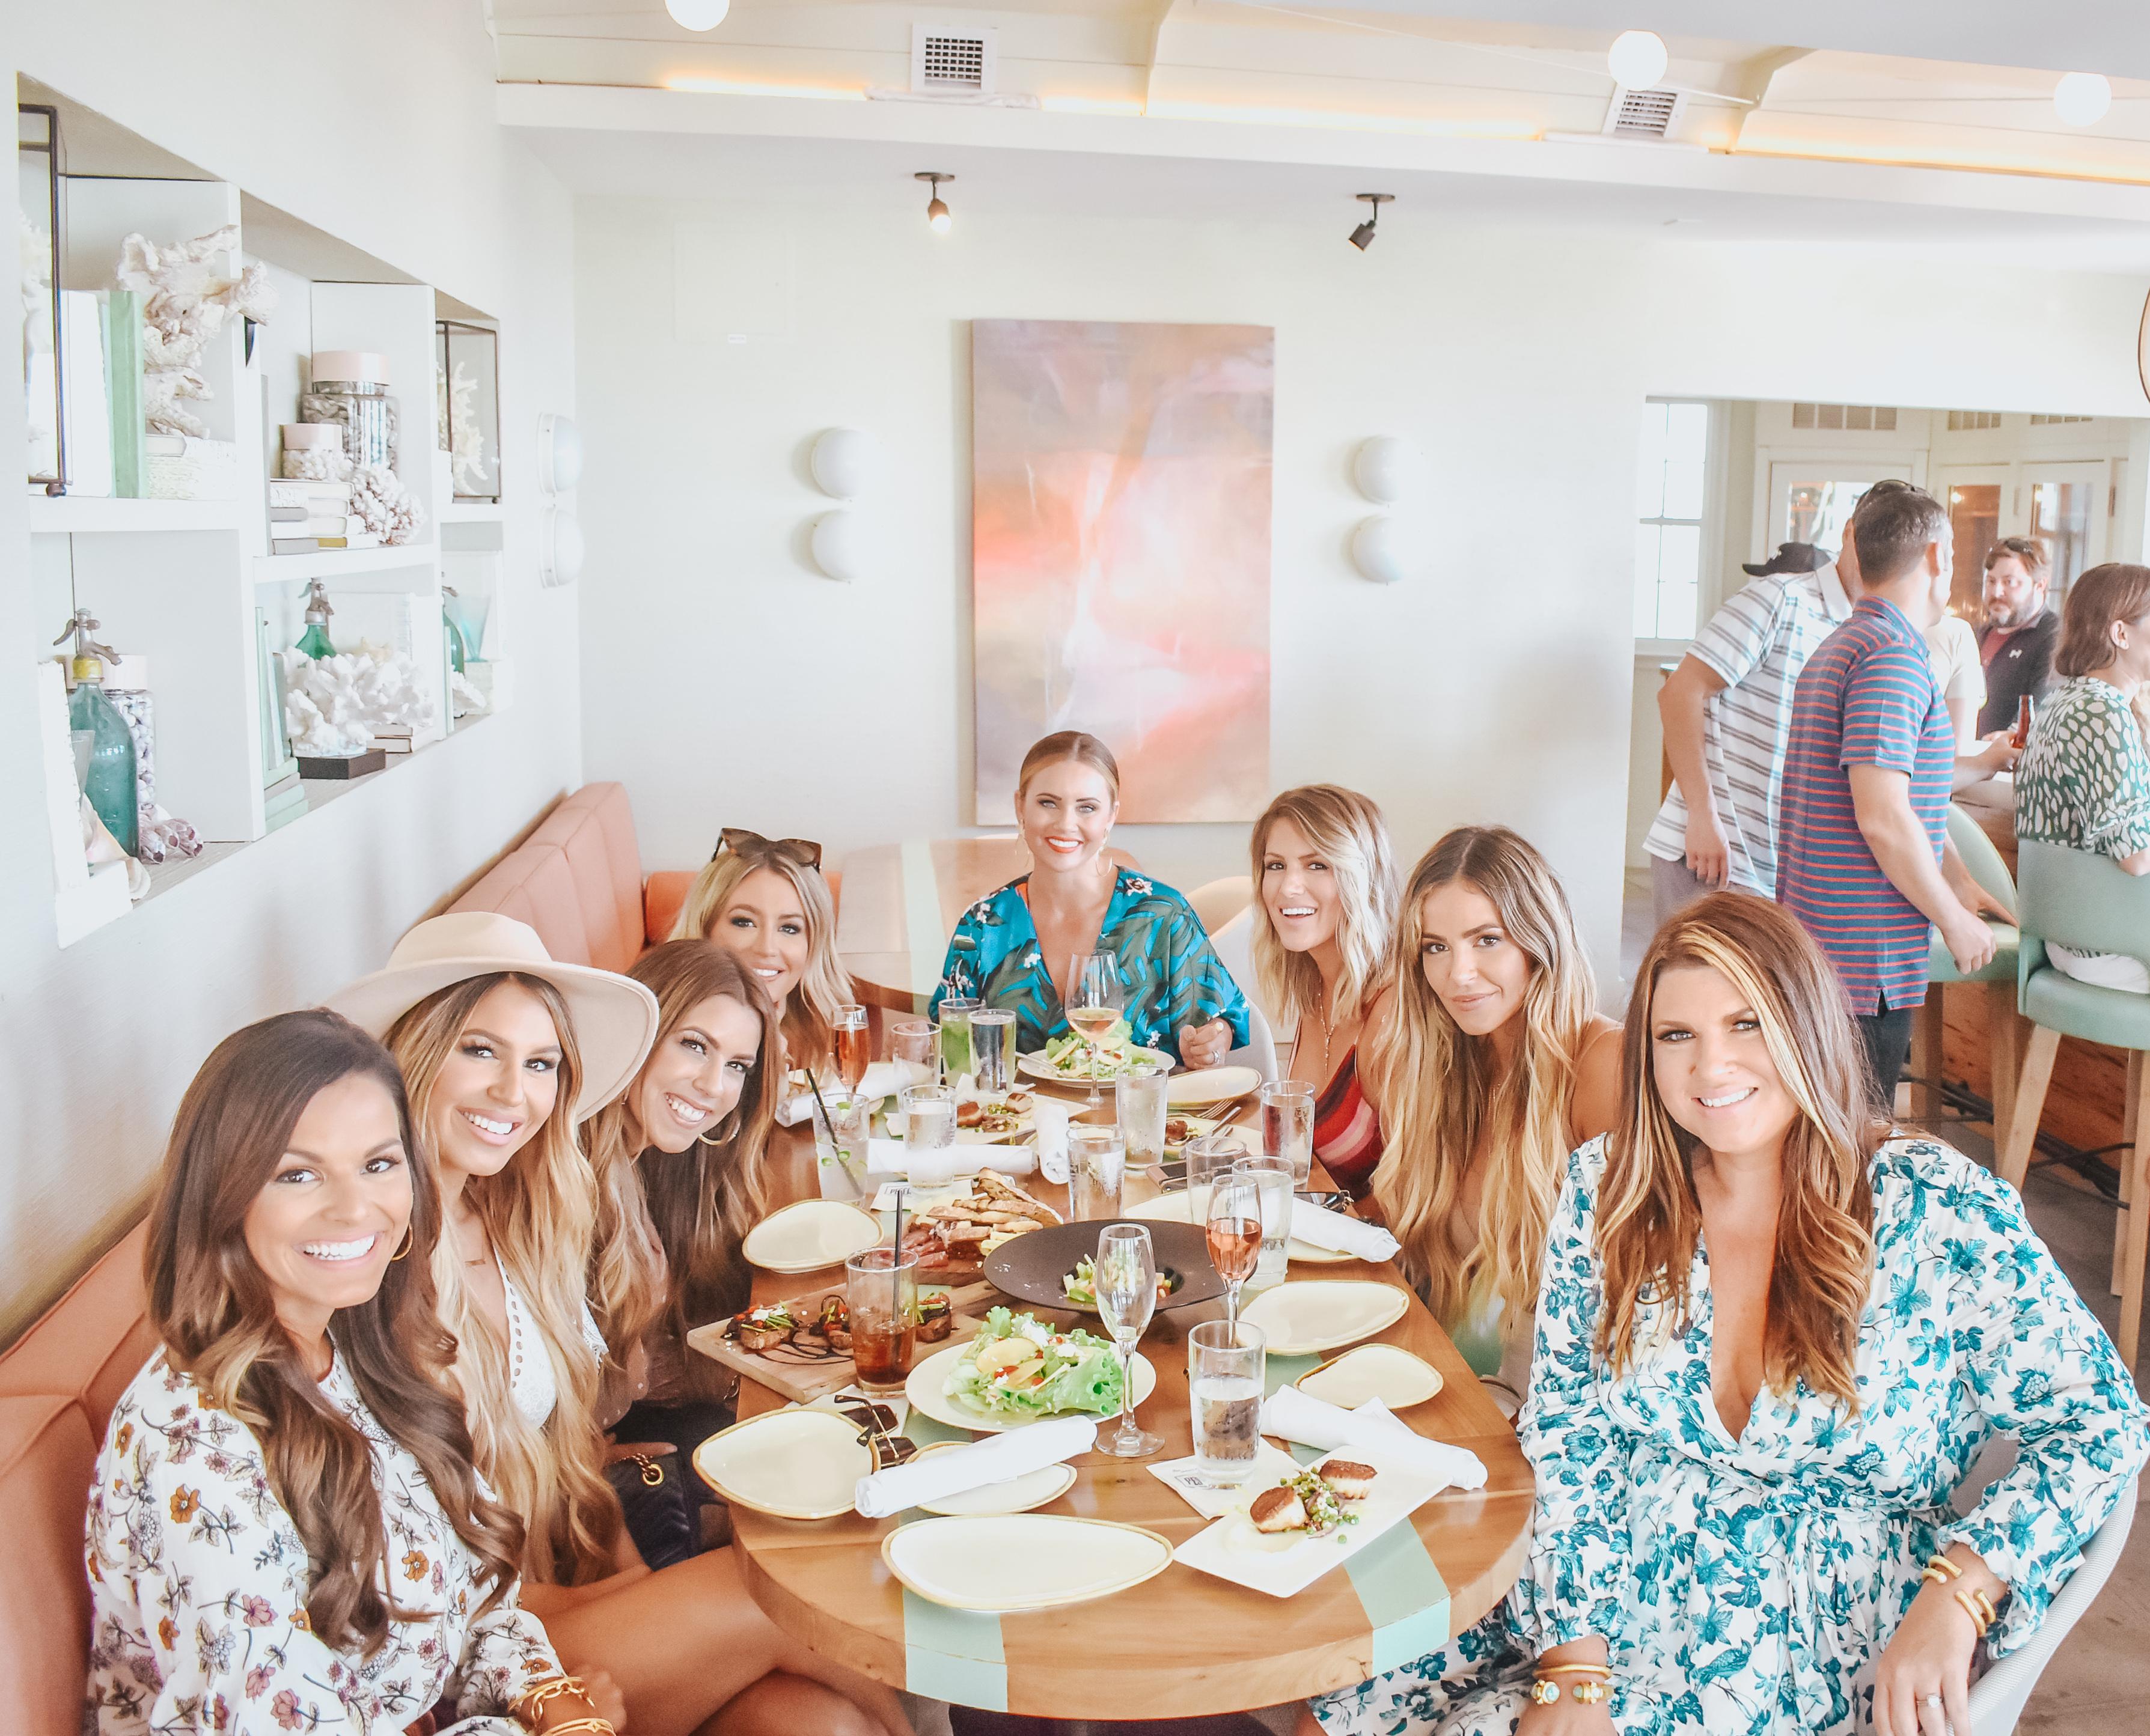 30A Blogger Weekend - Katy Harrell, Hollie Woodward, Bailey Schwartz, Sarah Knuth, Brooke Webb, Jessica Fay, Jordan Underwood and Jami Ray at Pescado Rosemary Beach